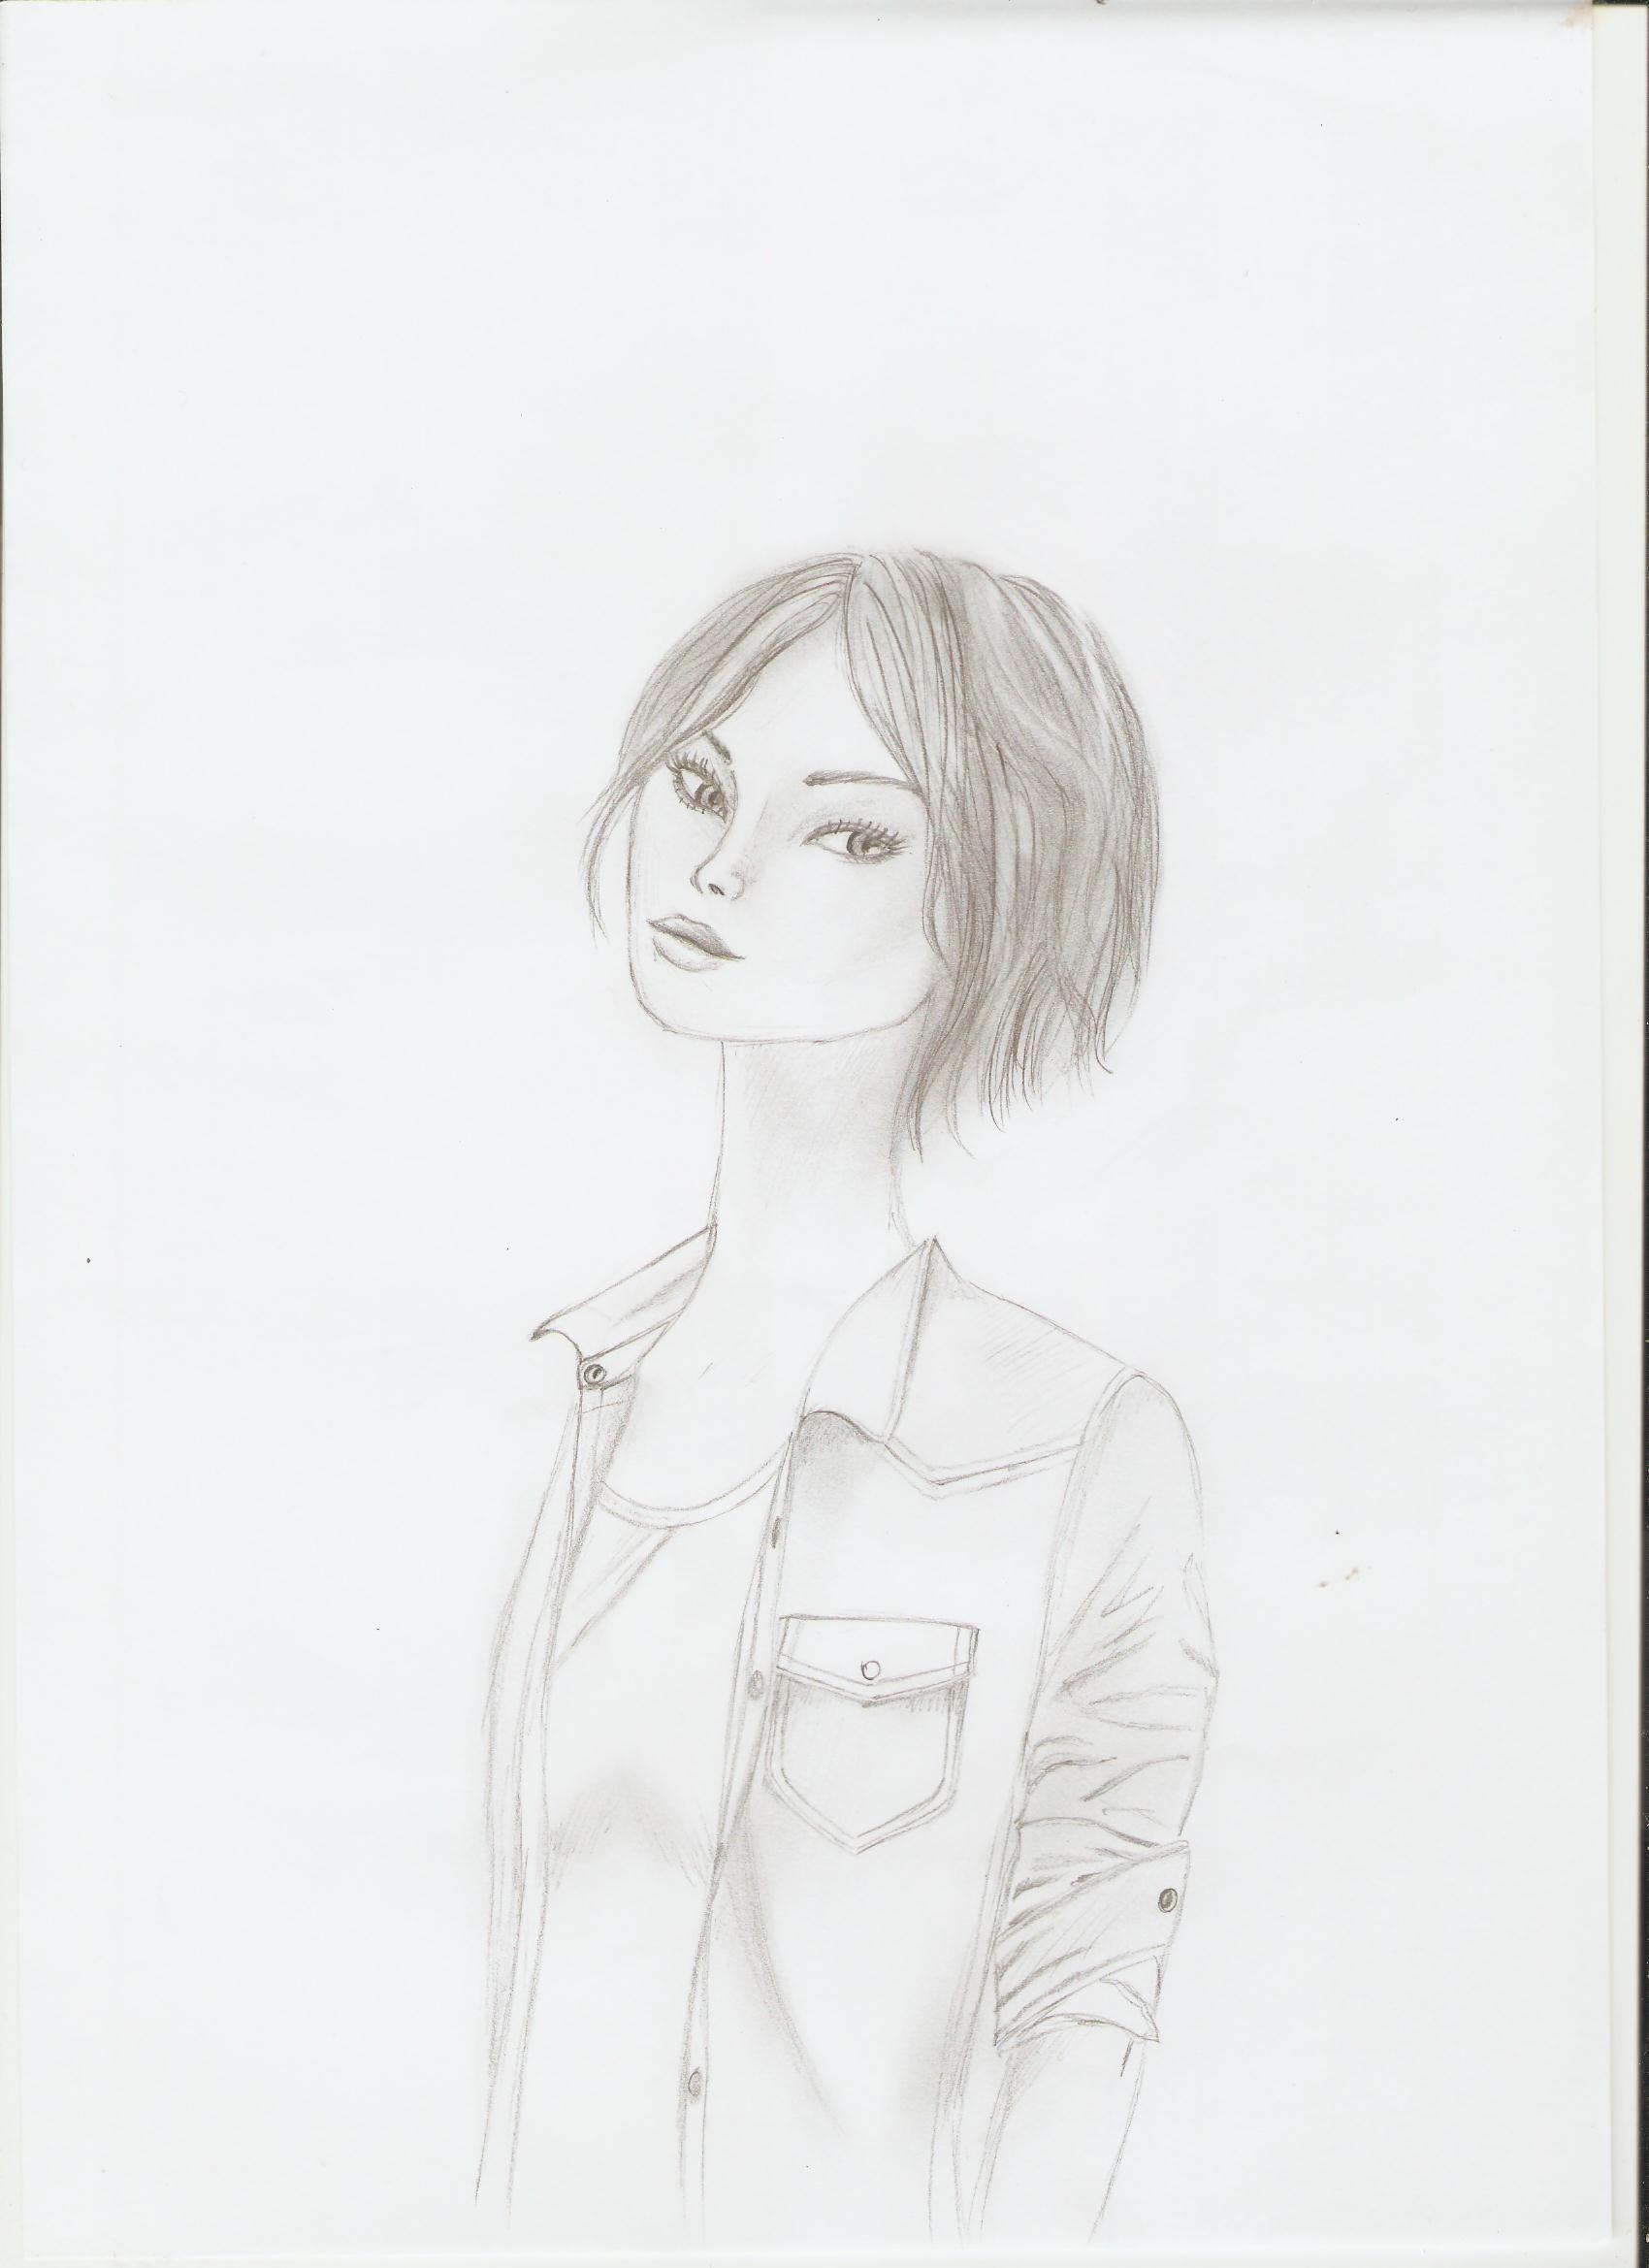 Drawings Of Girls With Short Hair : drawings, girls, short, Drawing,, Girl,, Short, Female, Sketch,, Styles,, Drawings